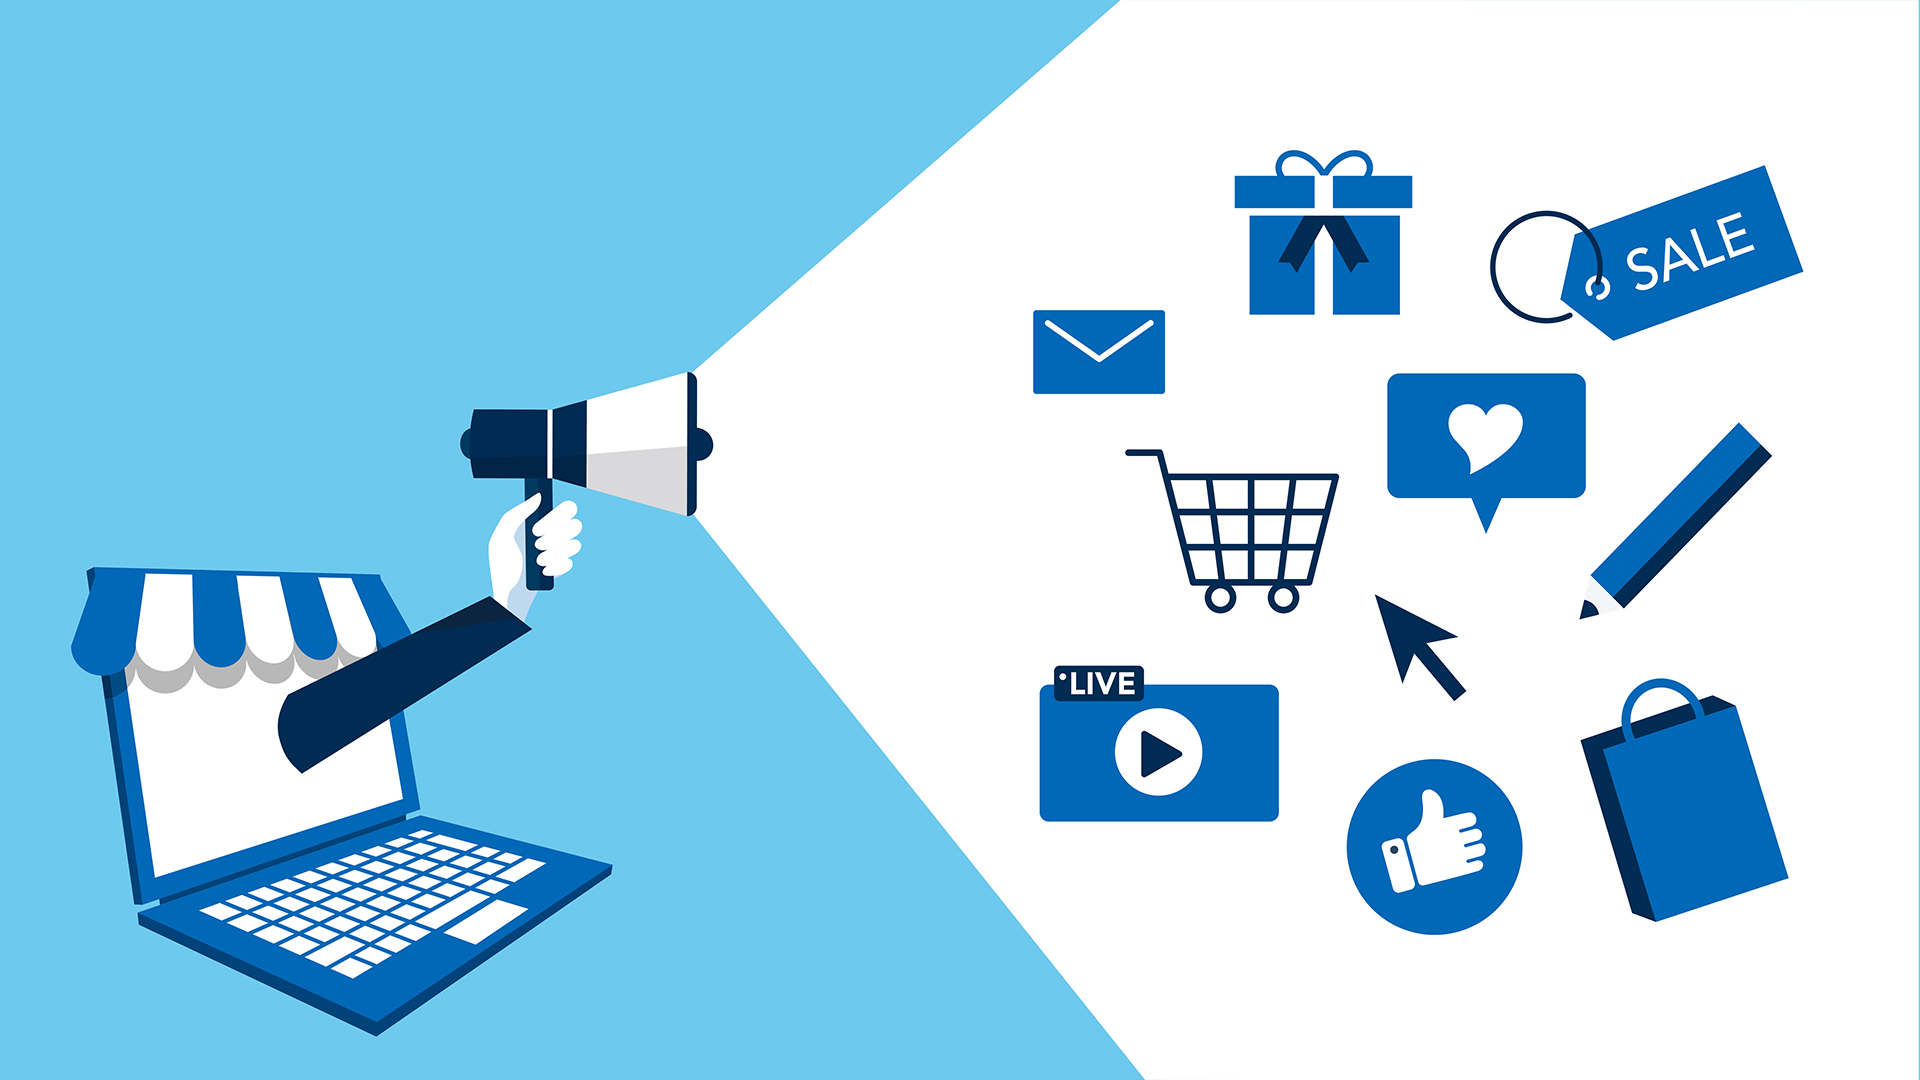 ECサイトに必要なマーケティング施策とは?